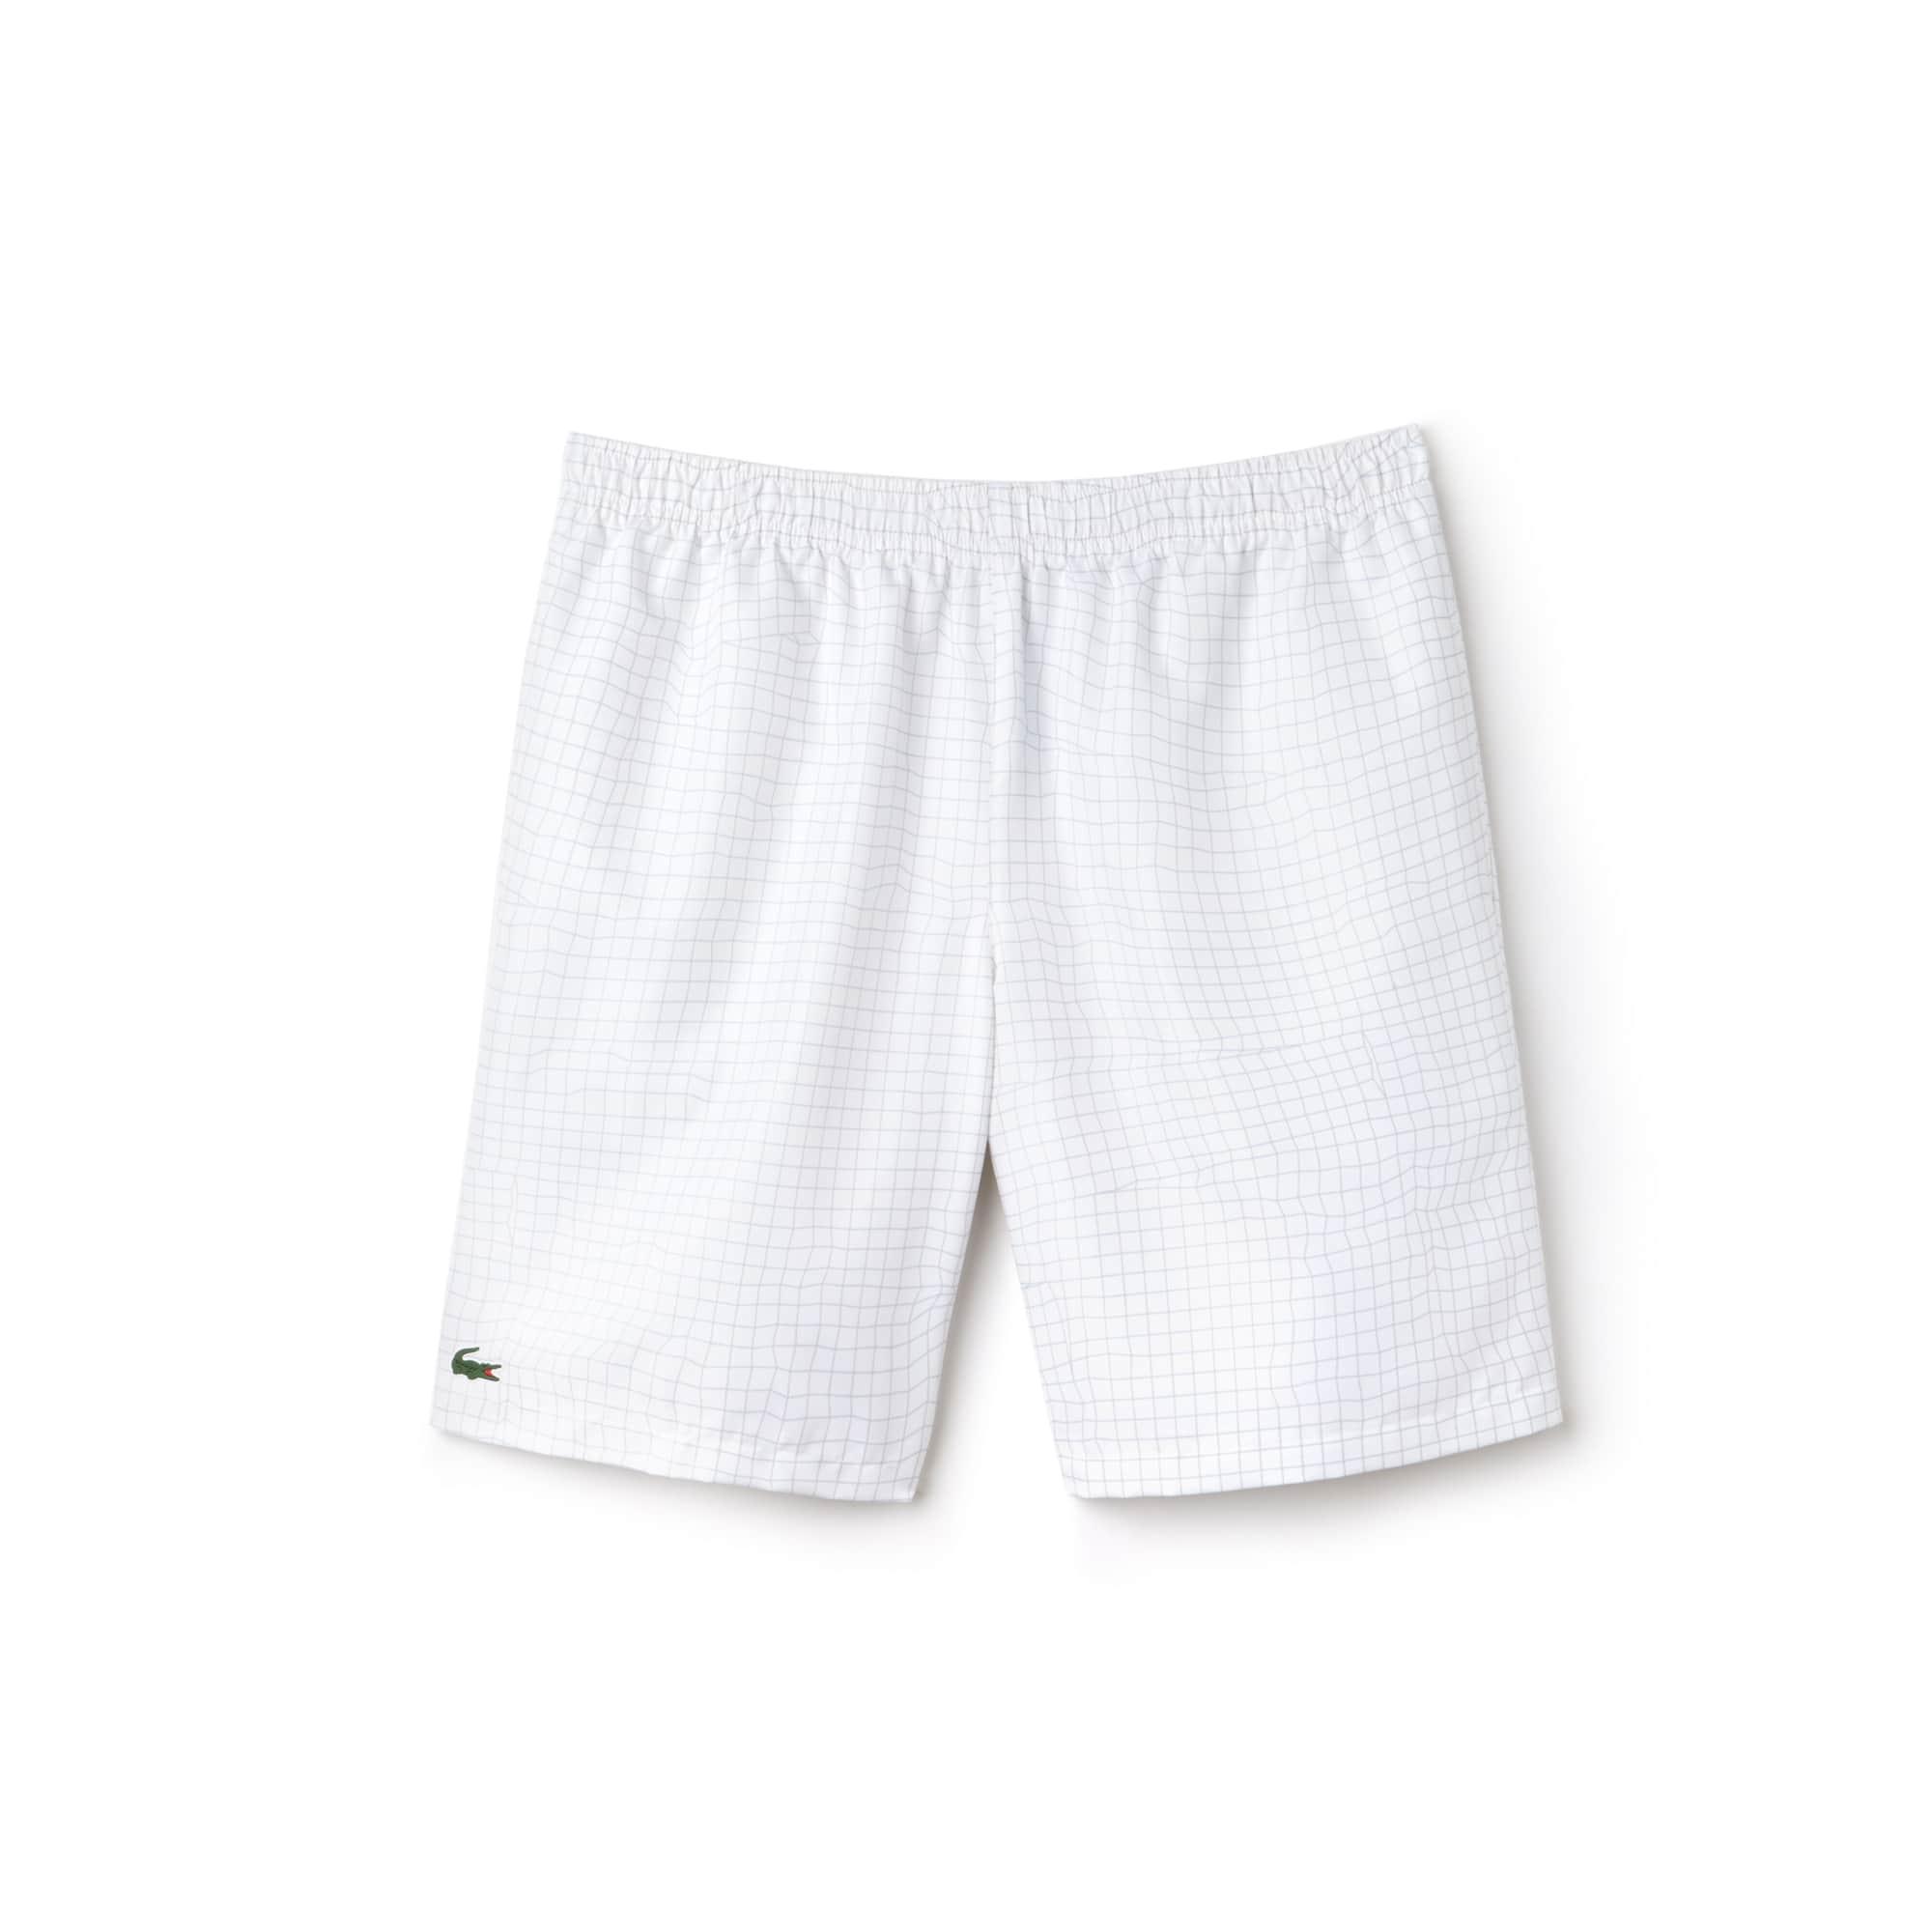 Men's SPORT Net Print Taffeta Tennis Shorts